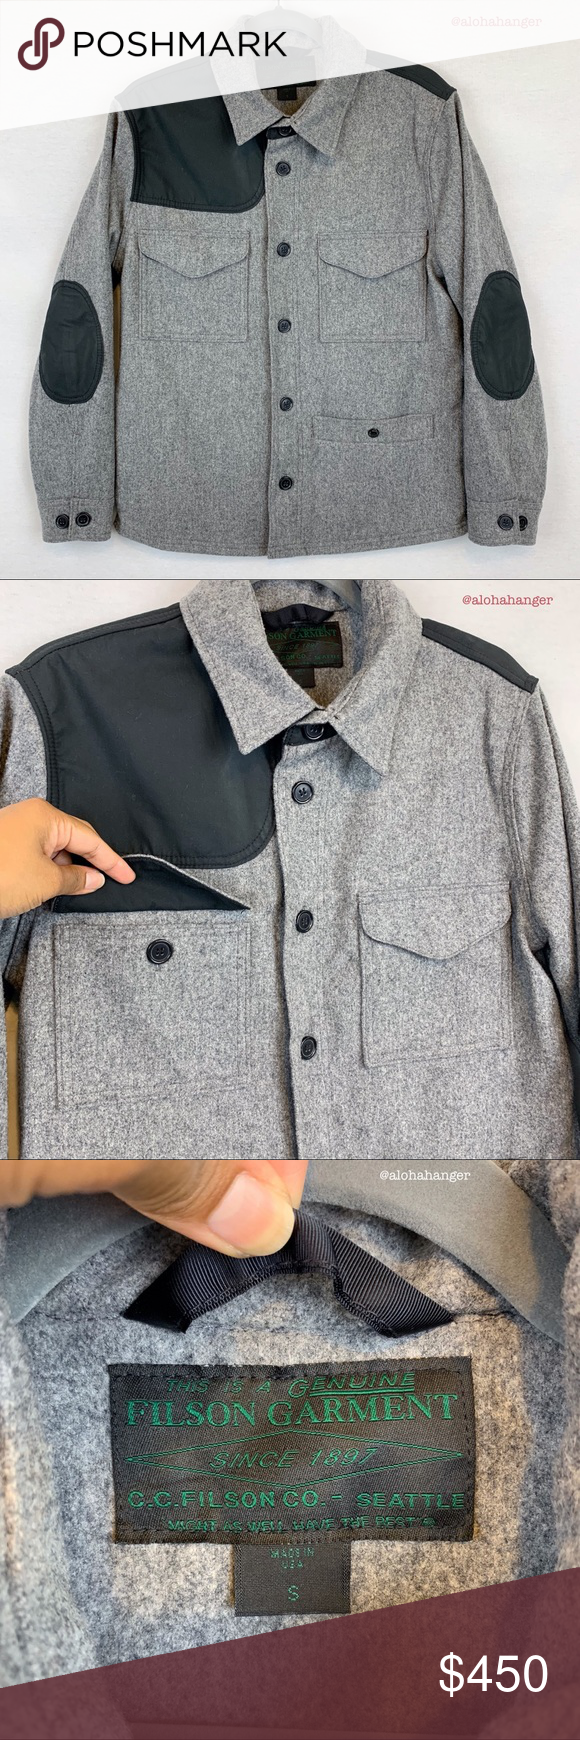 14efd4fbd Filson Limited Edition Rare 100% Wool Jacket! Single Mackinaw 100 ...